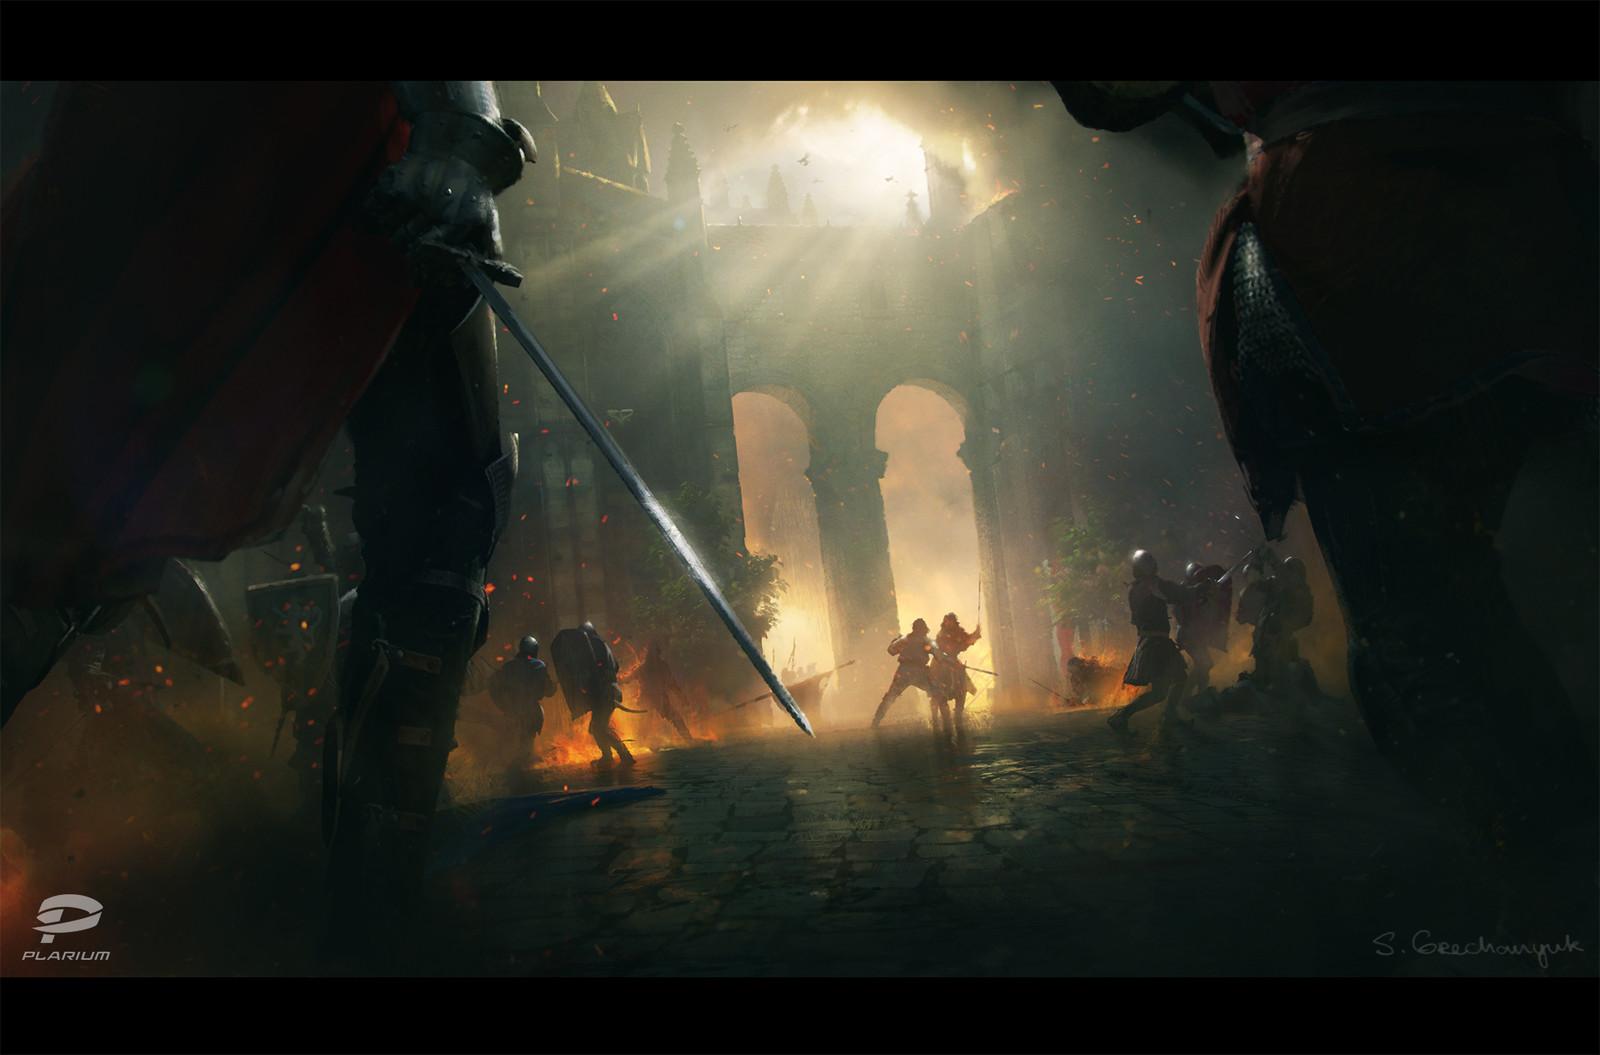 Throne: Kingdom at War key frame illustartion